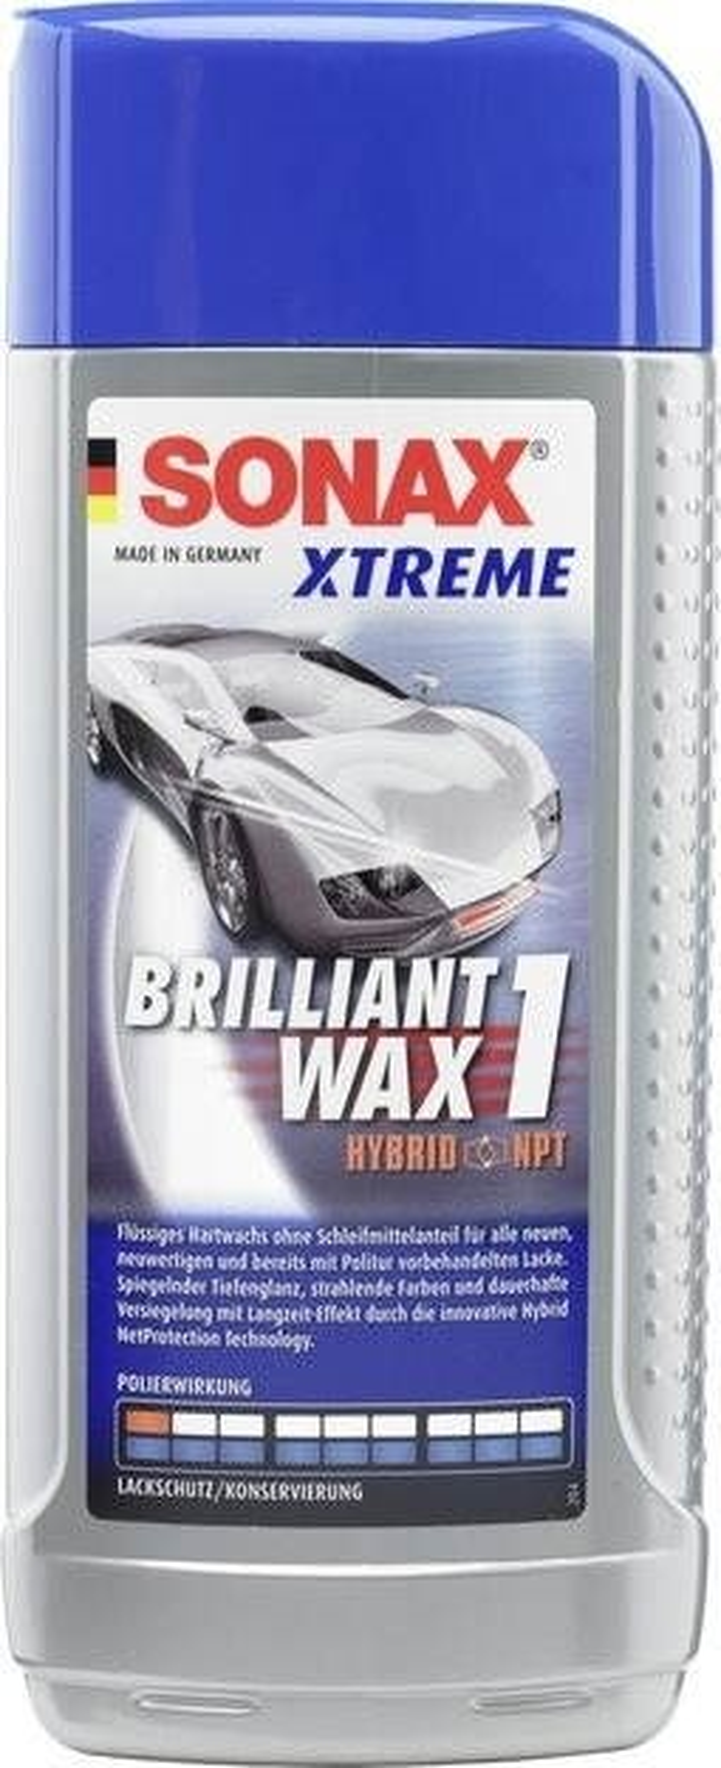 sonax xtreme brilliant wax 1 vosk 500ml autokosmetika. Black Bedroom Furniture Sets. Home Design Ideas